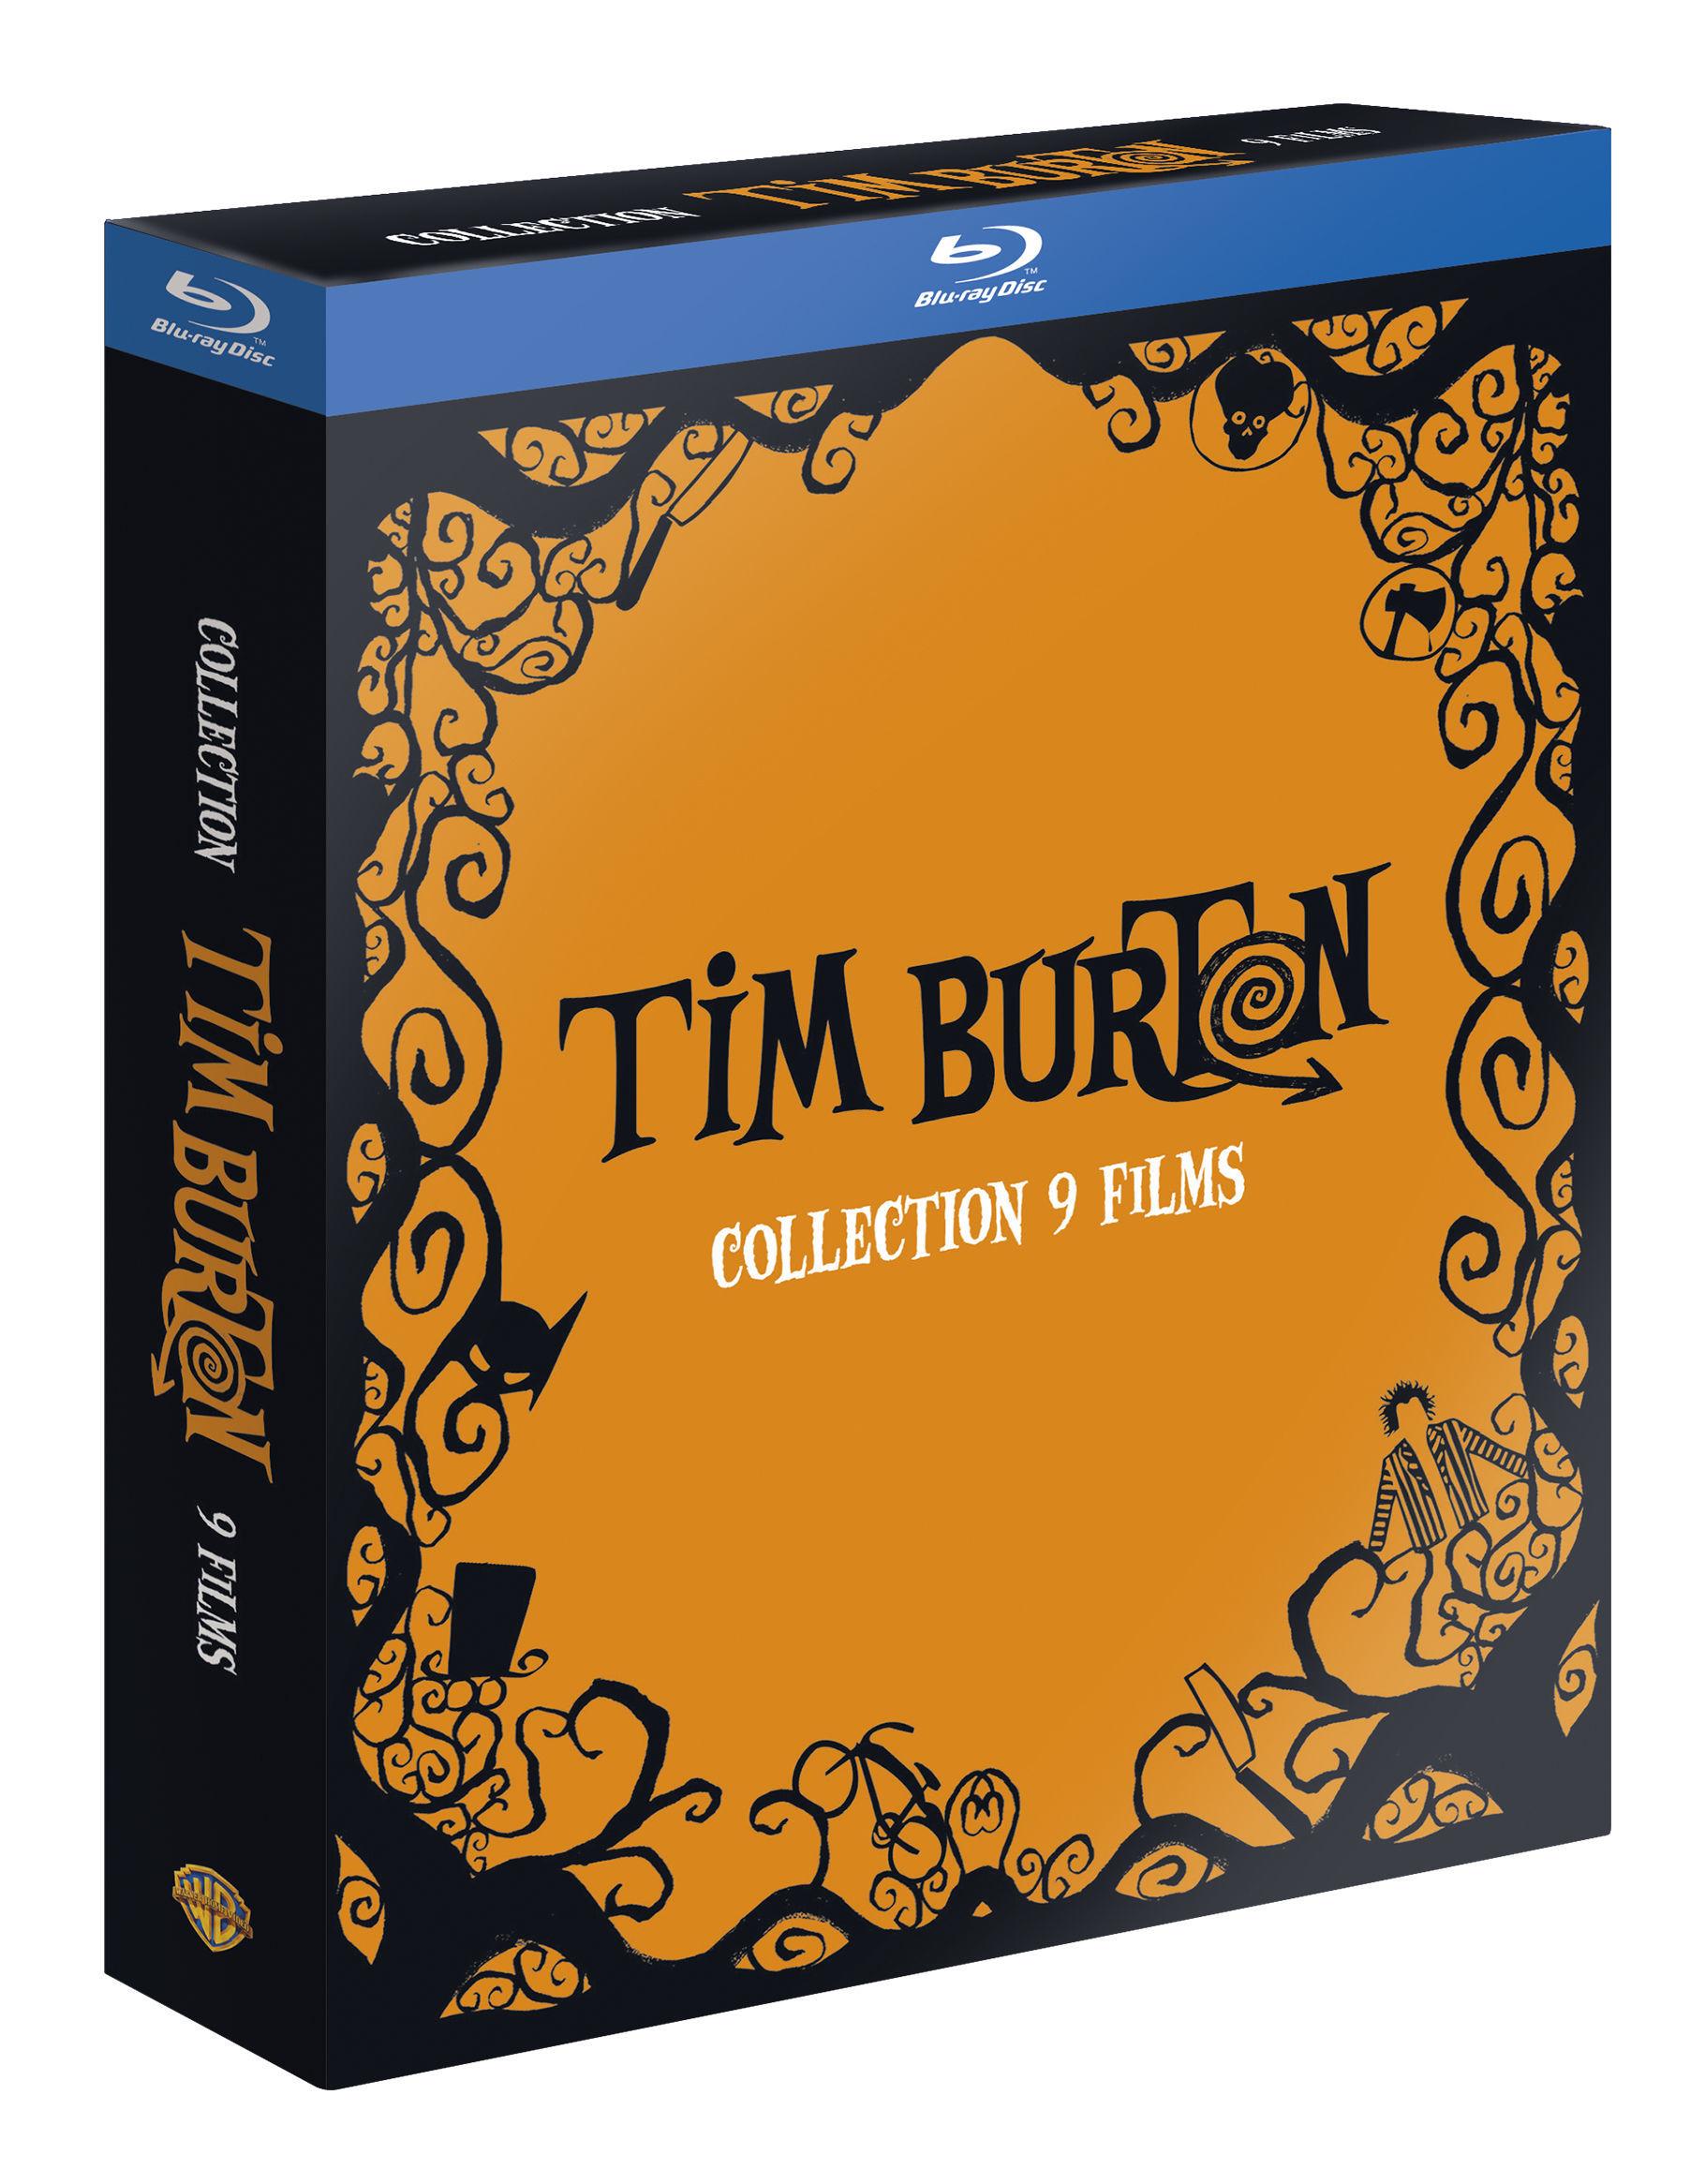 Coffret Tim Burton Blu-ray - 9 films